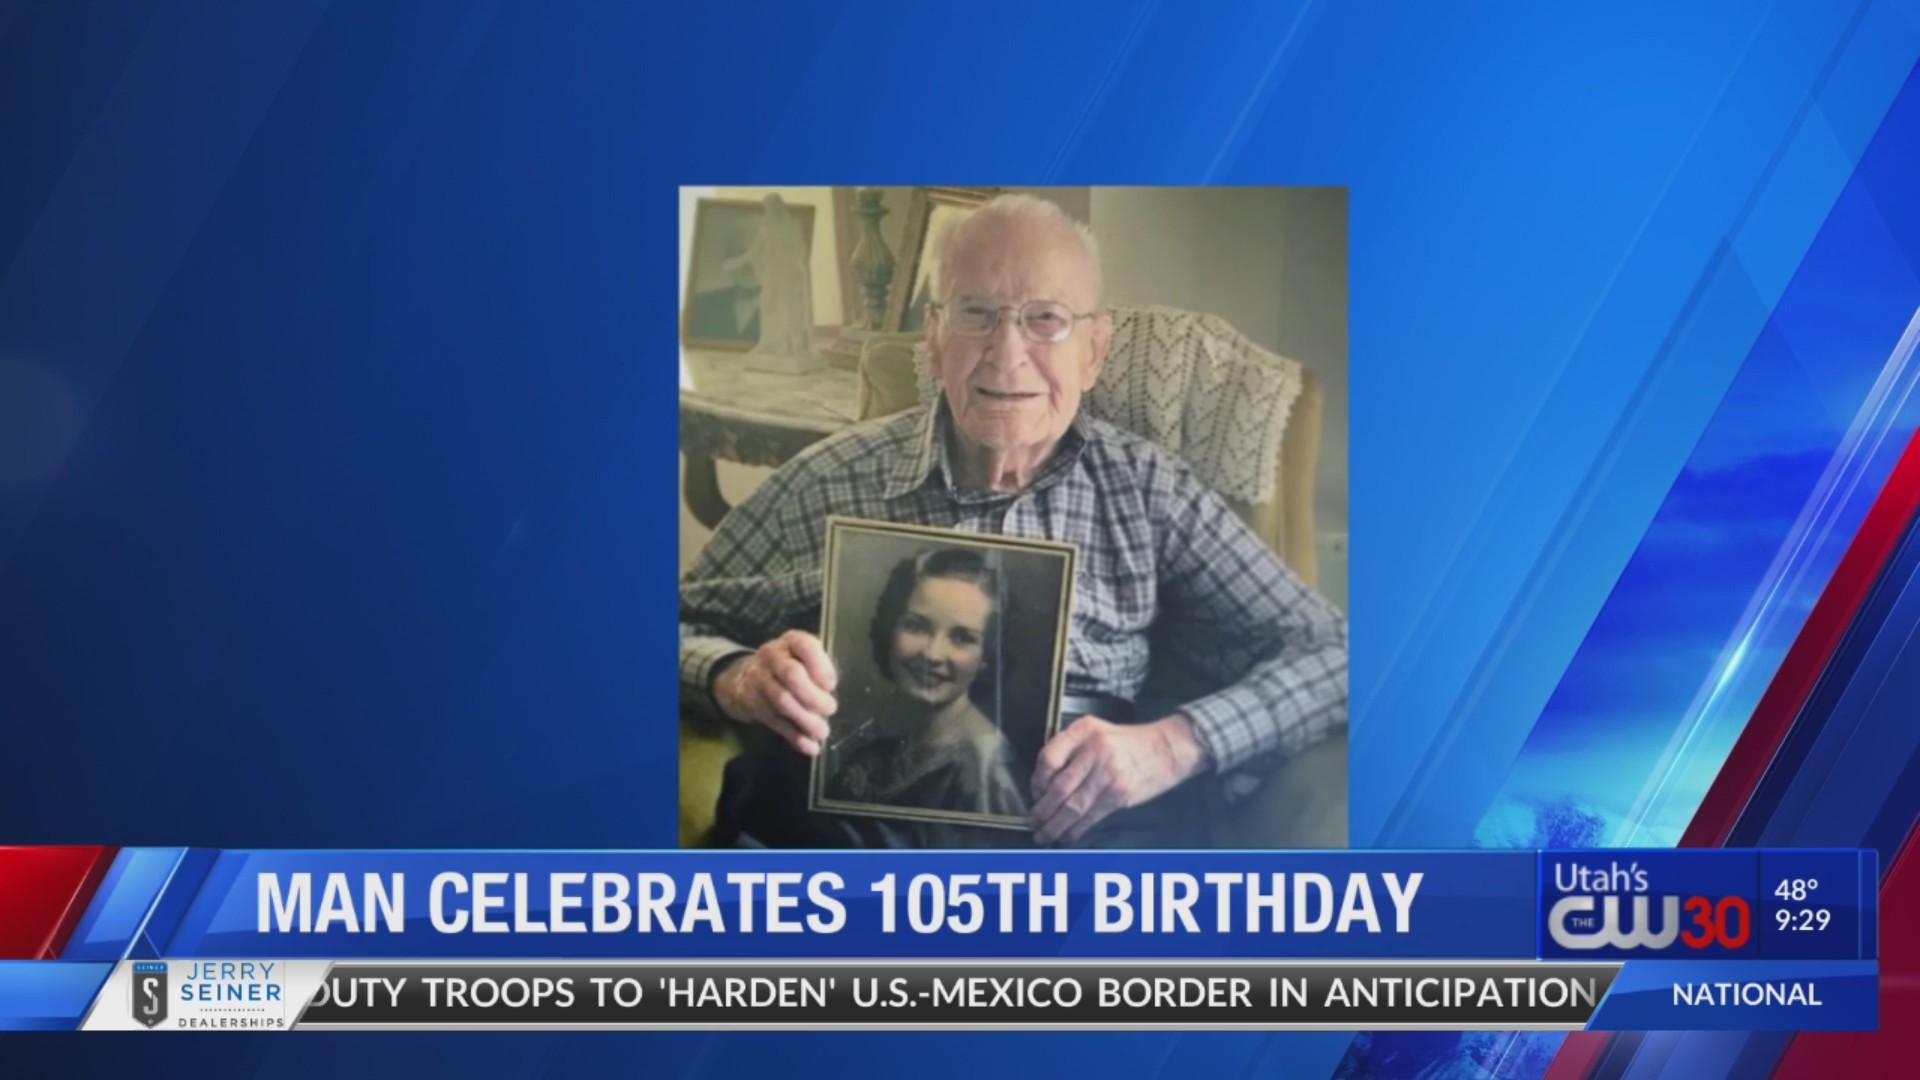 Utahn_celebrates_his_105th_birthday_0_20181030061709